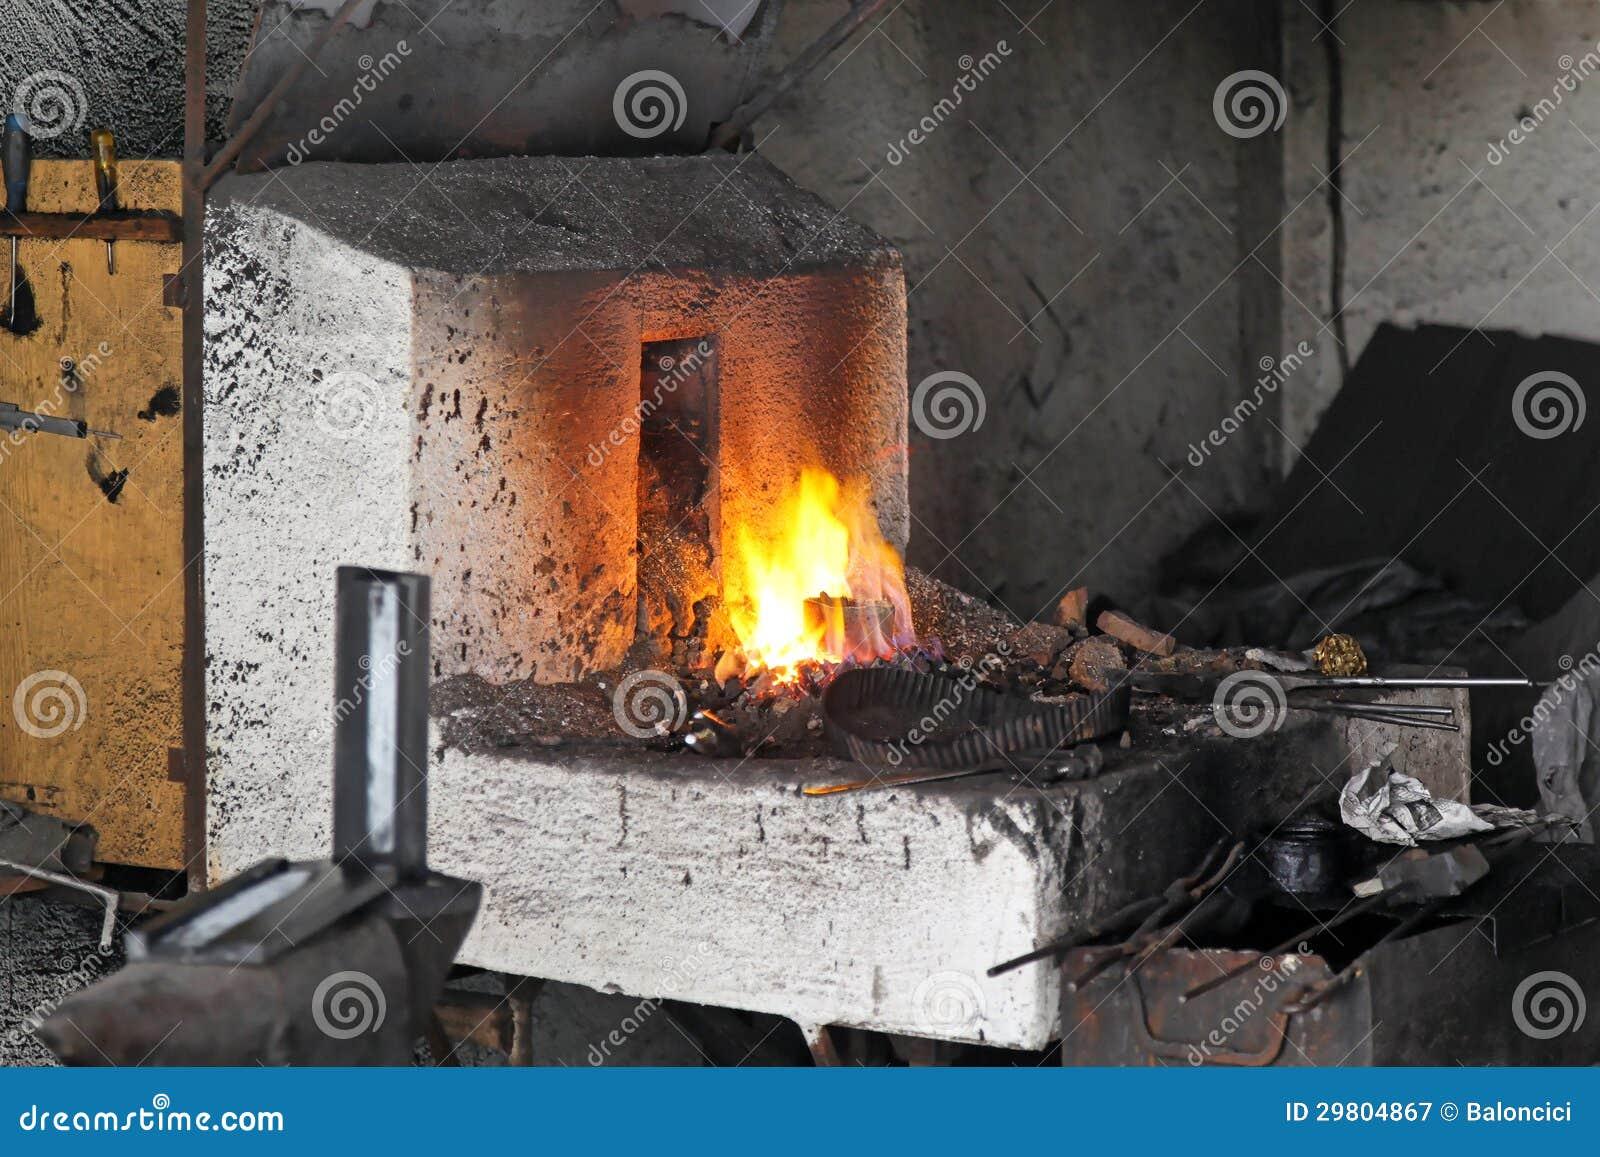 Plan Foyer De Forge : Blacksmith forge stock image of ironwork metal